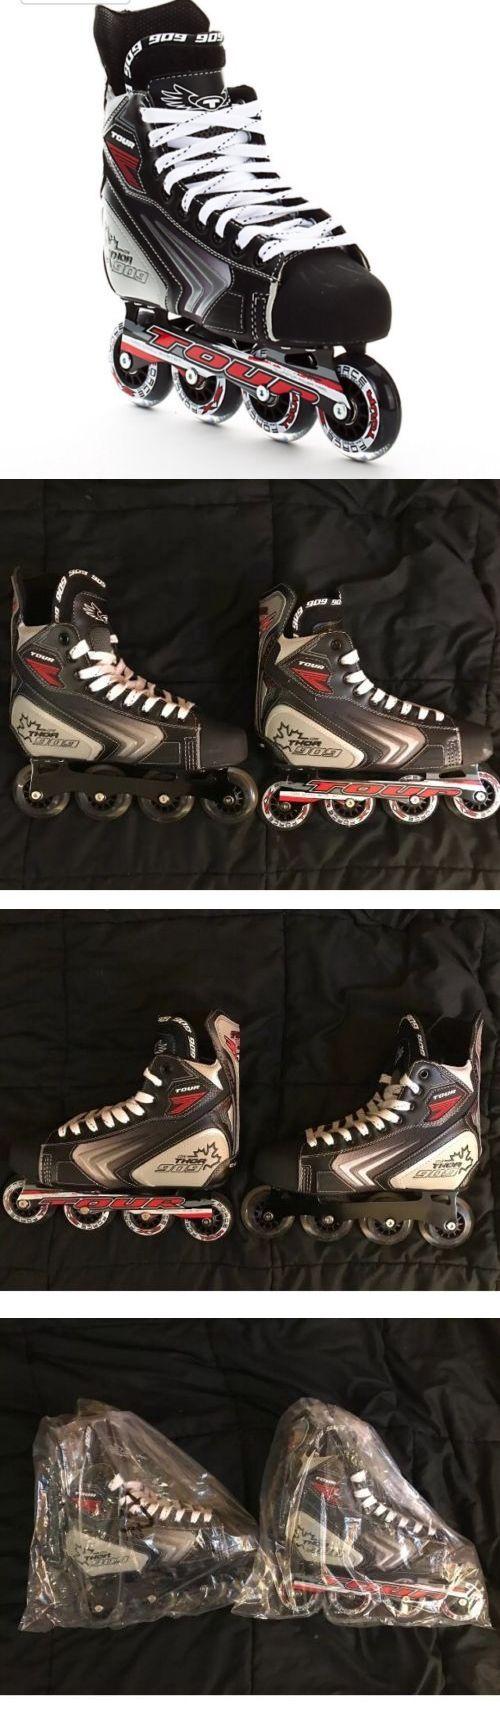 Roller Hockey 64669: New In Box Tour Thor 909 Code Roller Hockey Skates Blades Inline Skates Mens 6 -> BUY IT NOW ONLY: $84.95 on eBay!